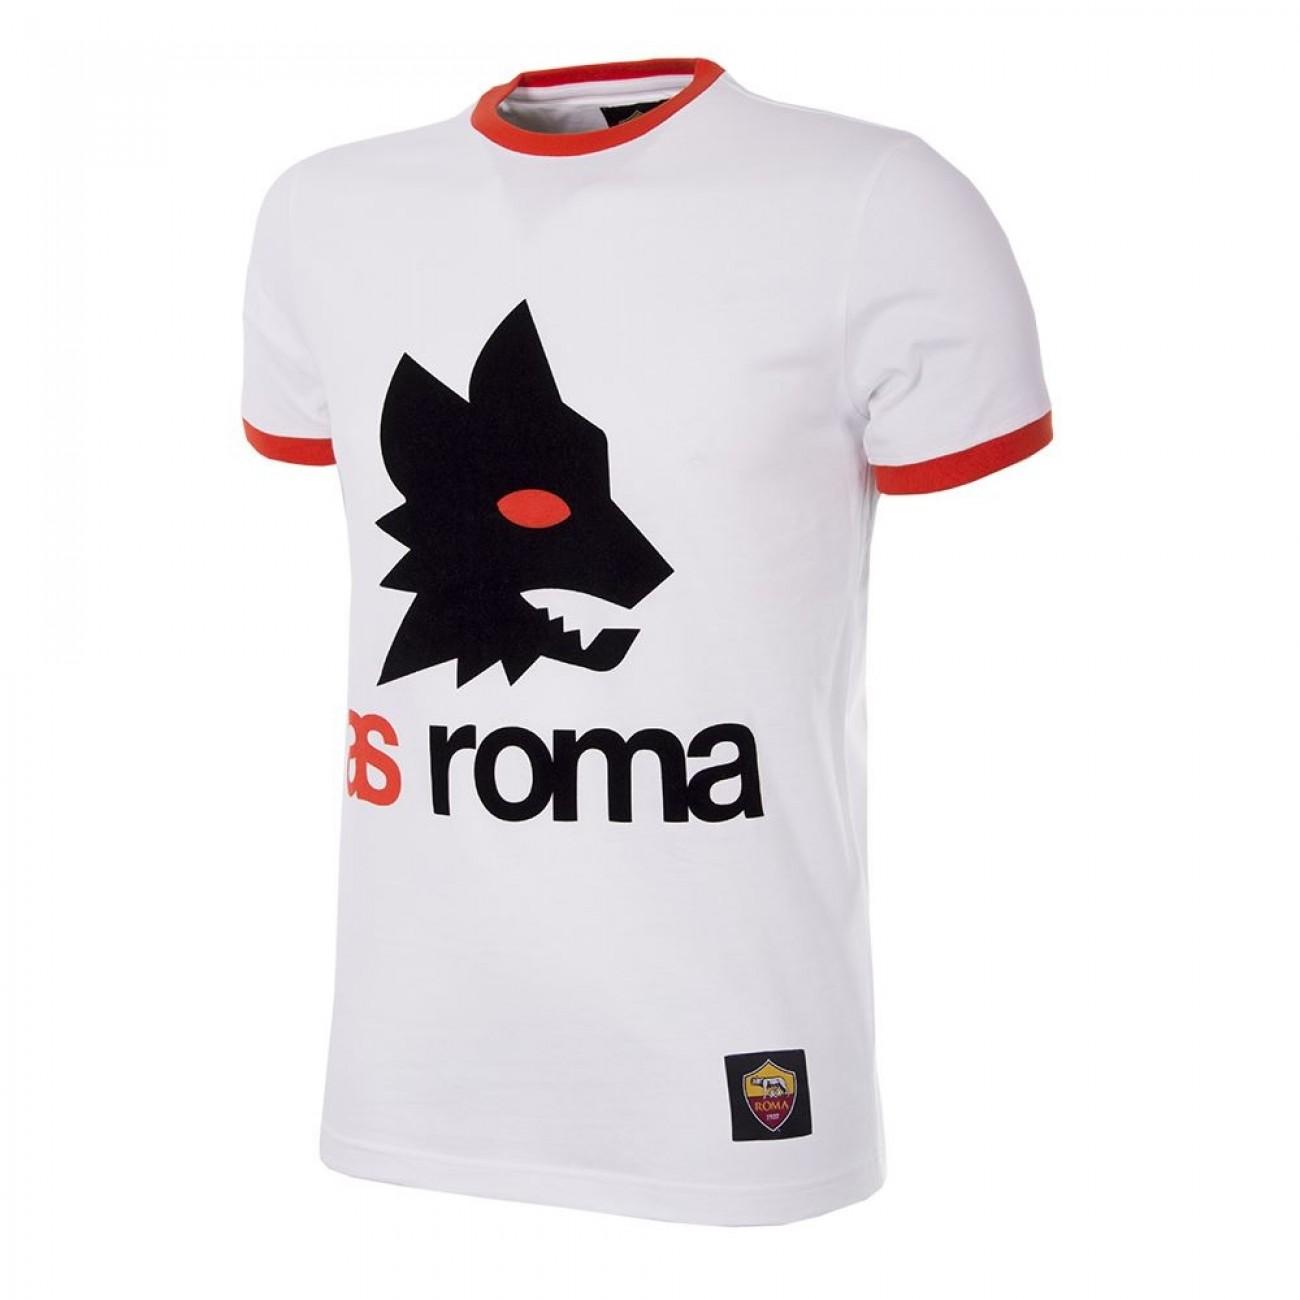 COPA Mens As Roma Black Out Retro Logo Sweater Black Out Retro Logo Sweater